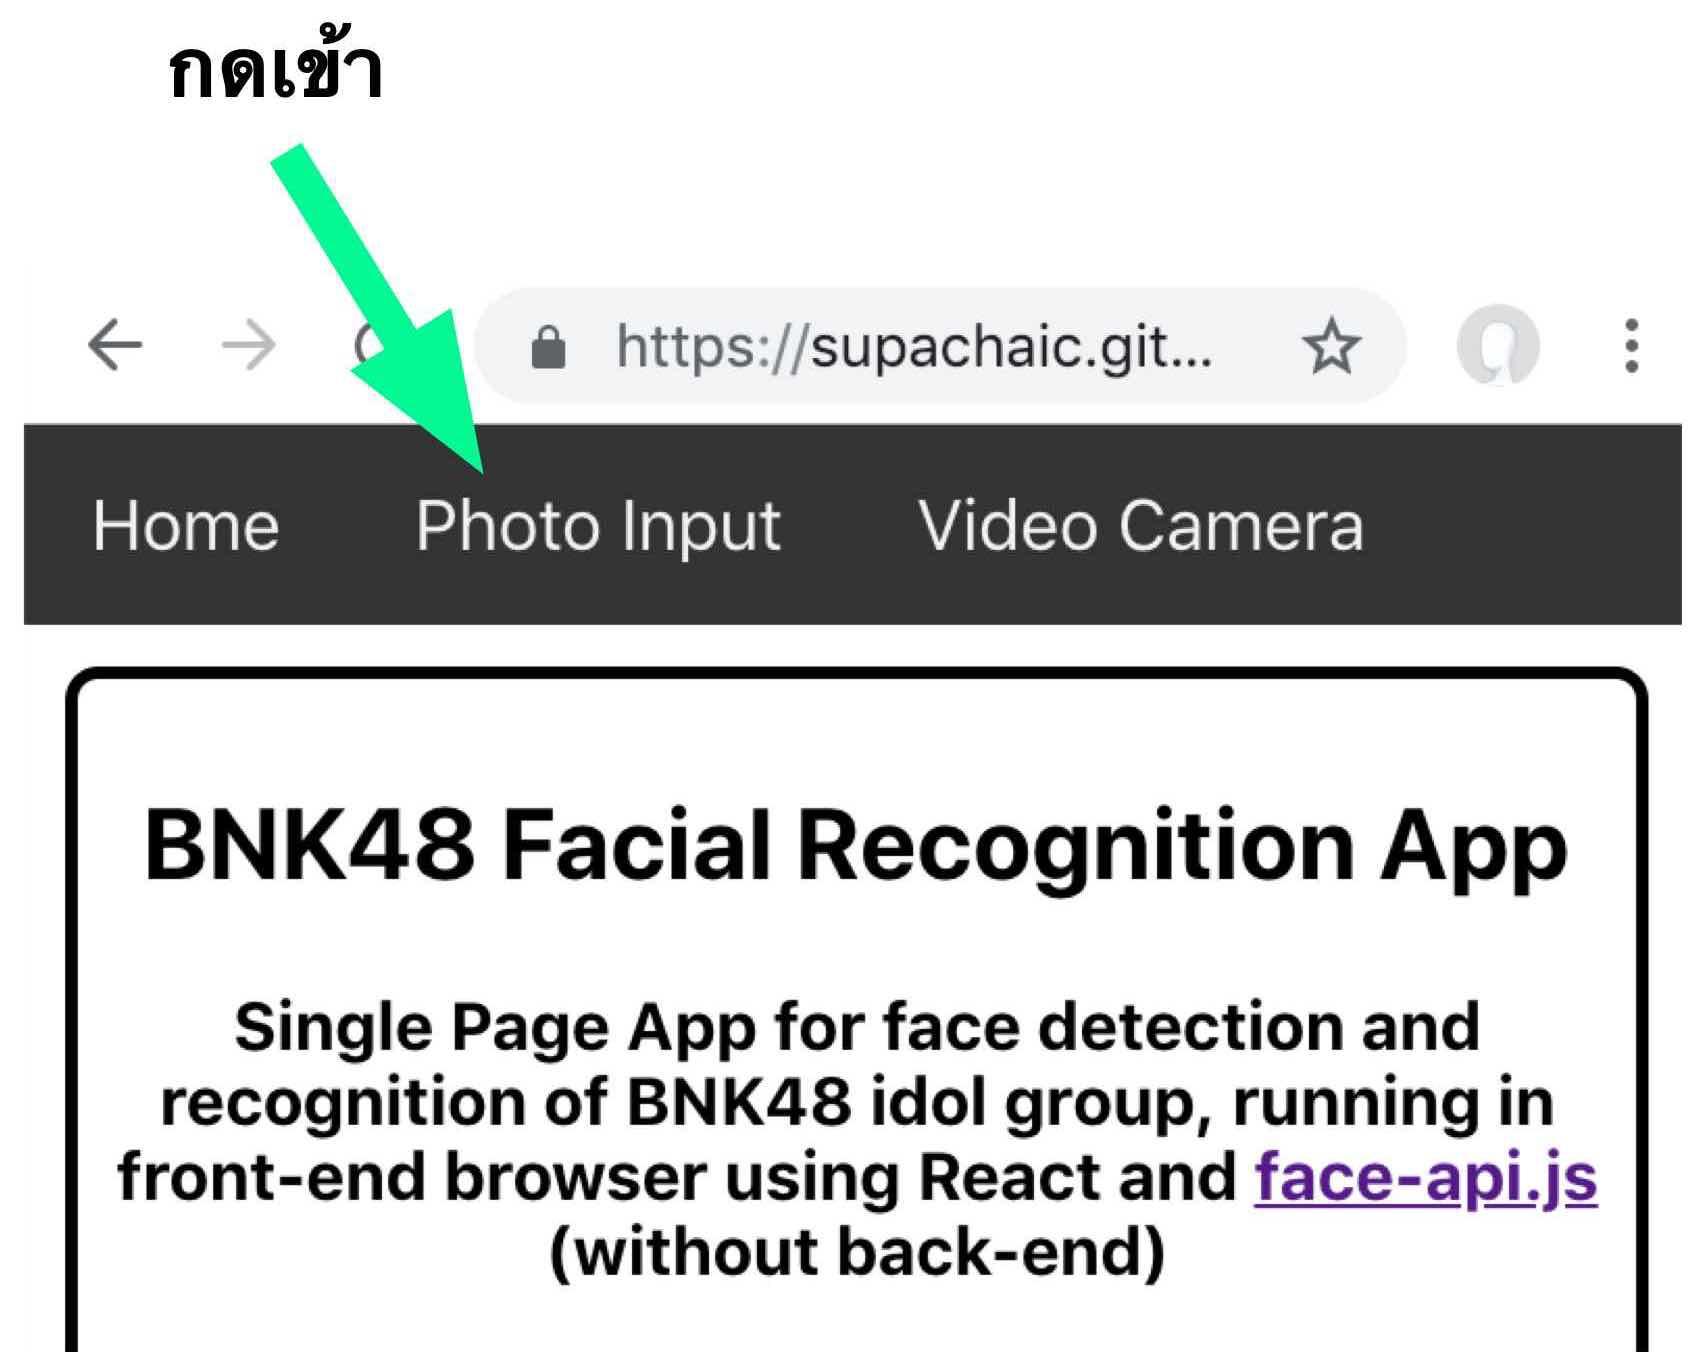 BNK48 vs AI ชวนทดสอบความแม่นยำของ Deep Learning ว่าจะทายชื่อ